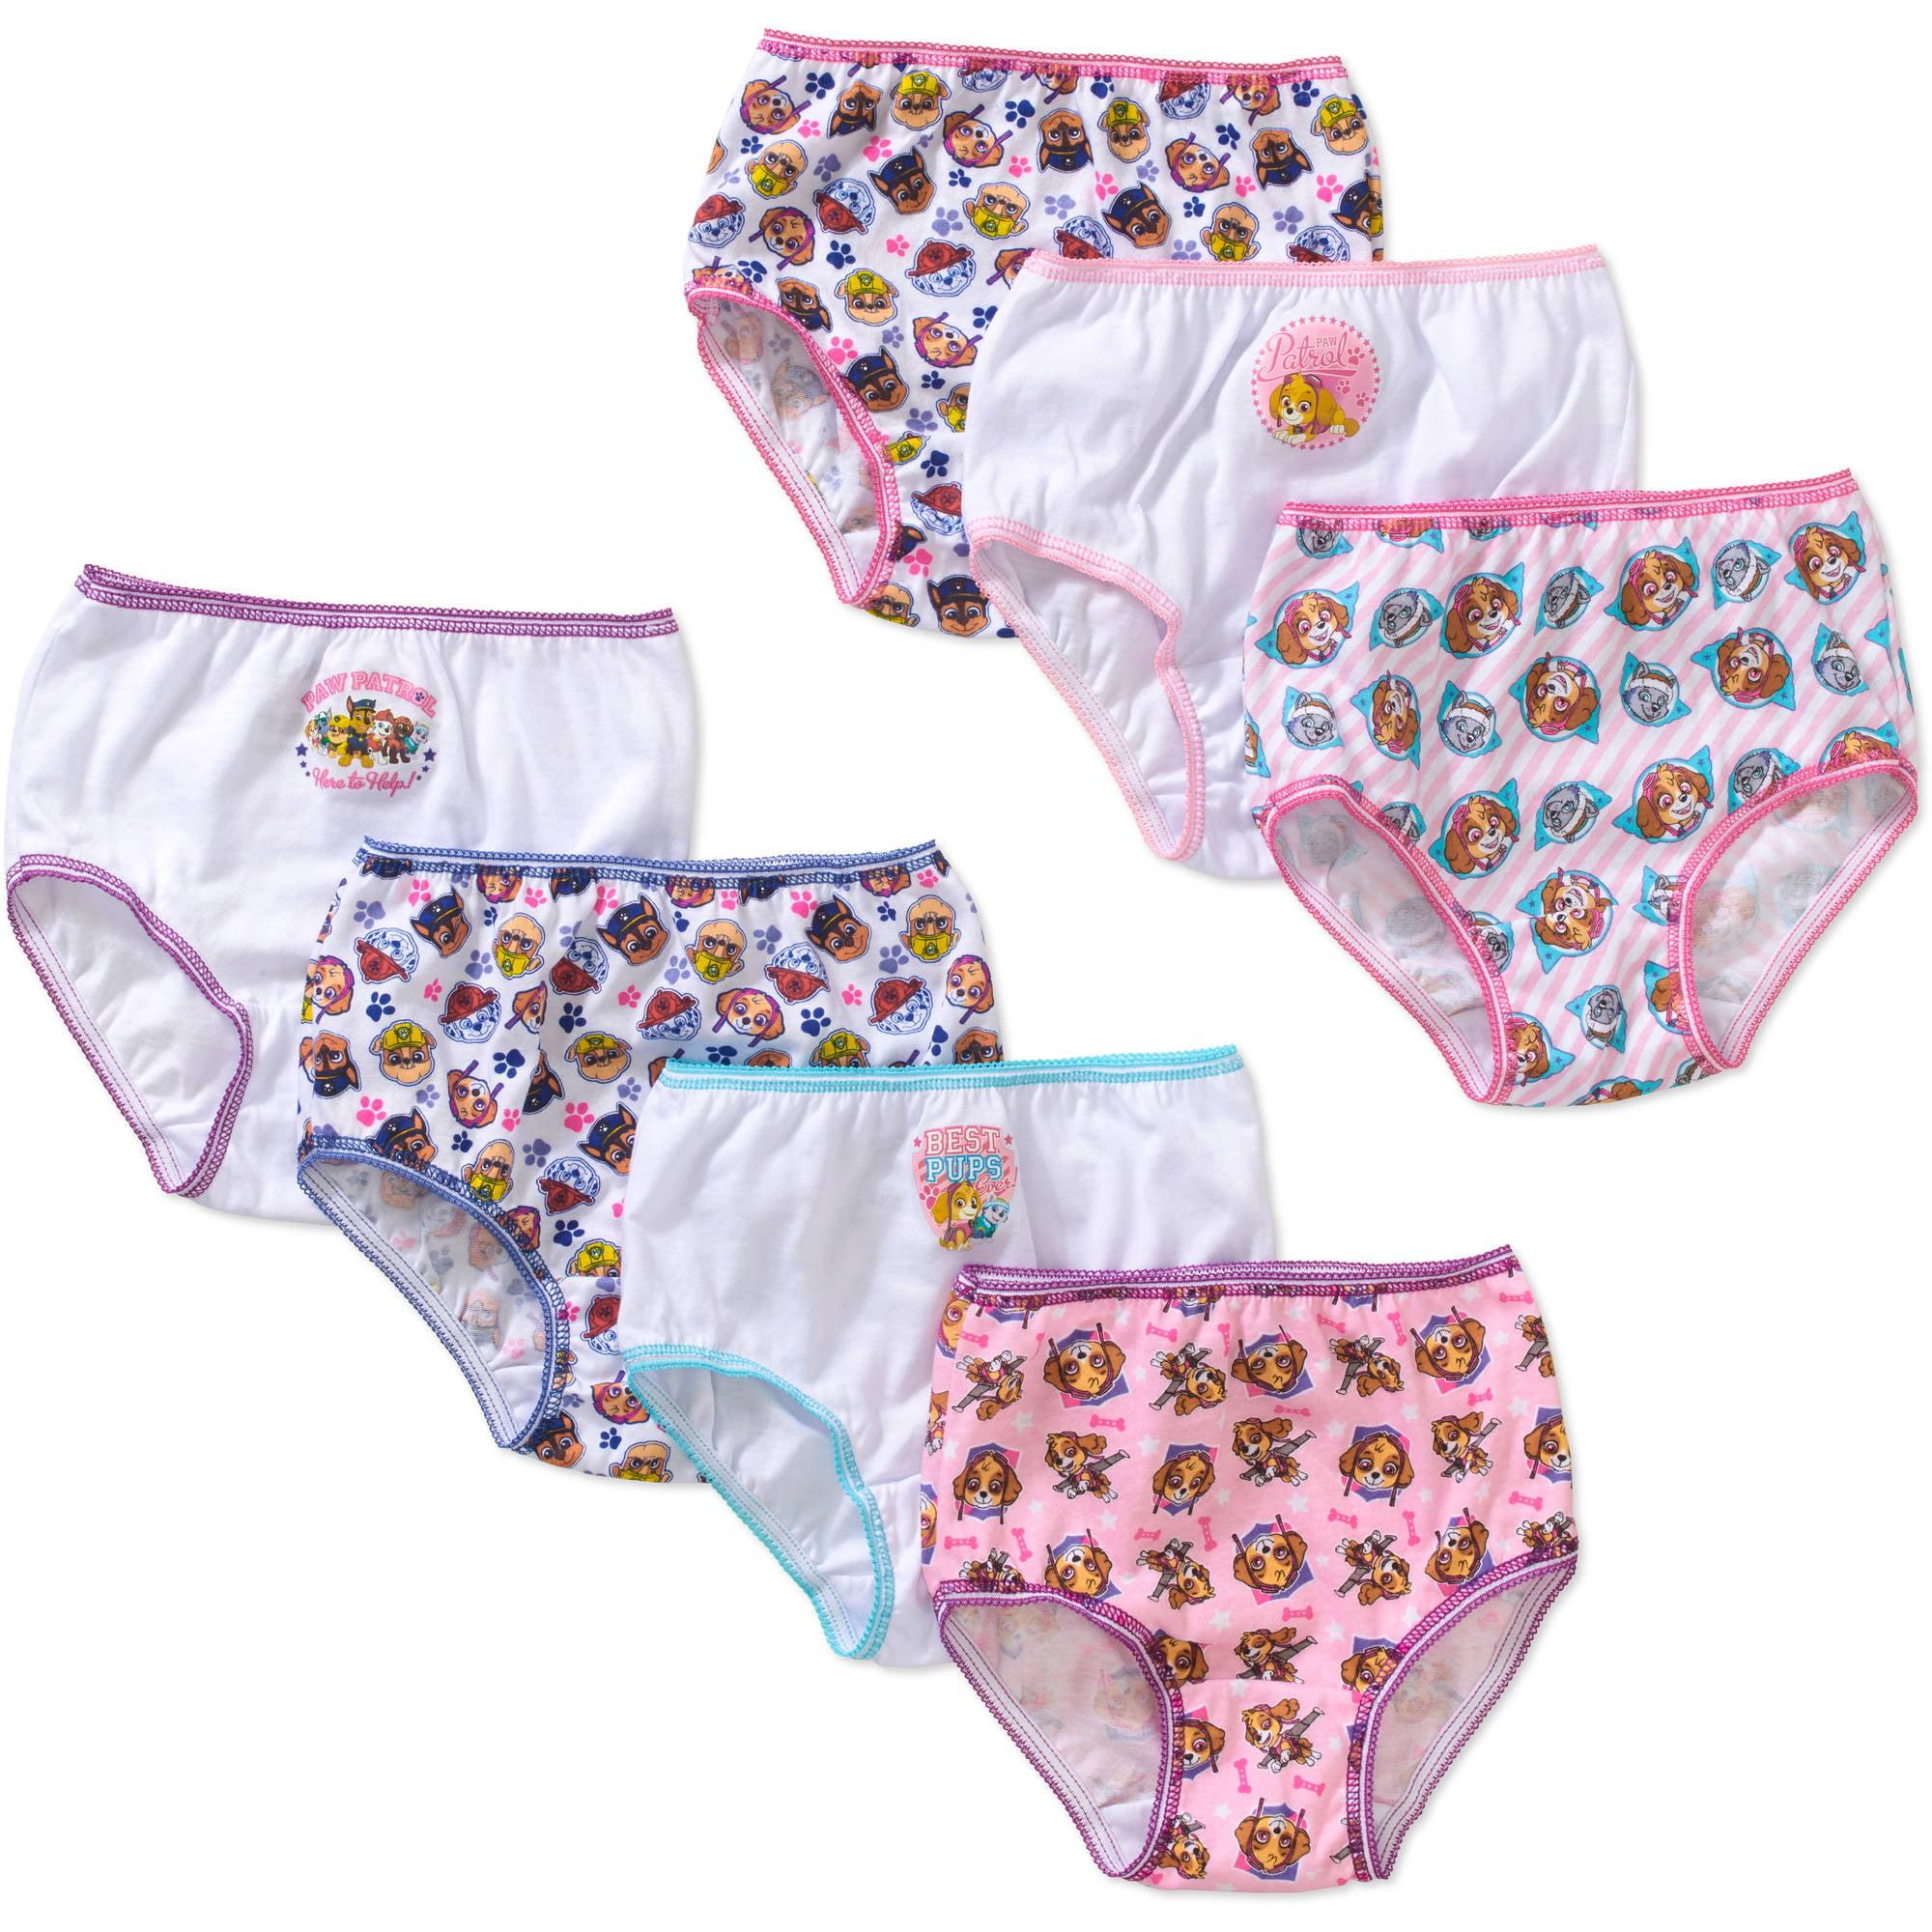 PAW Patrol Toddler Girls' underwear, 7-Pack